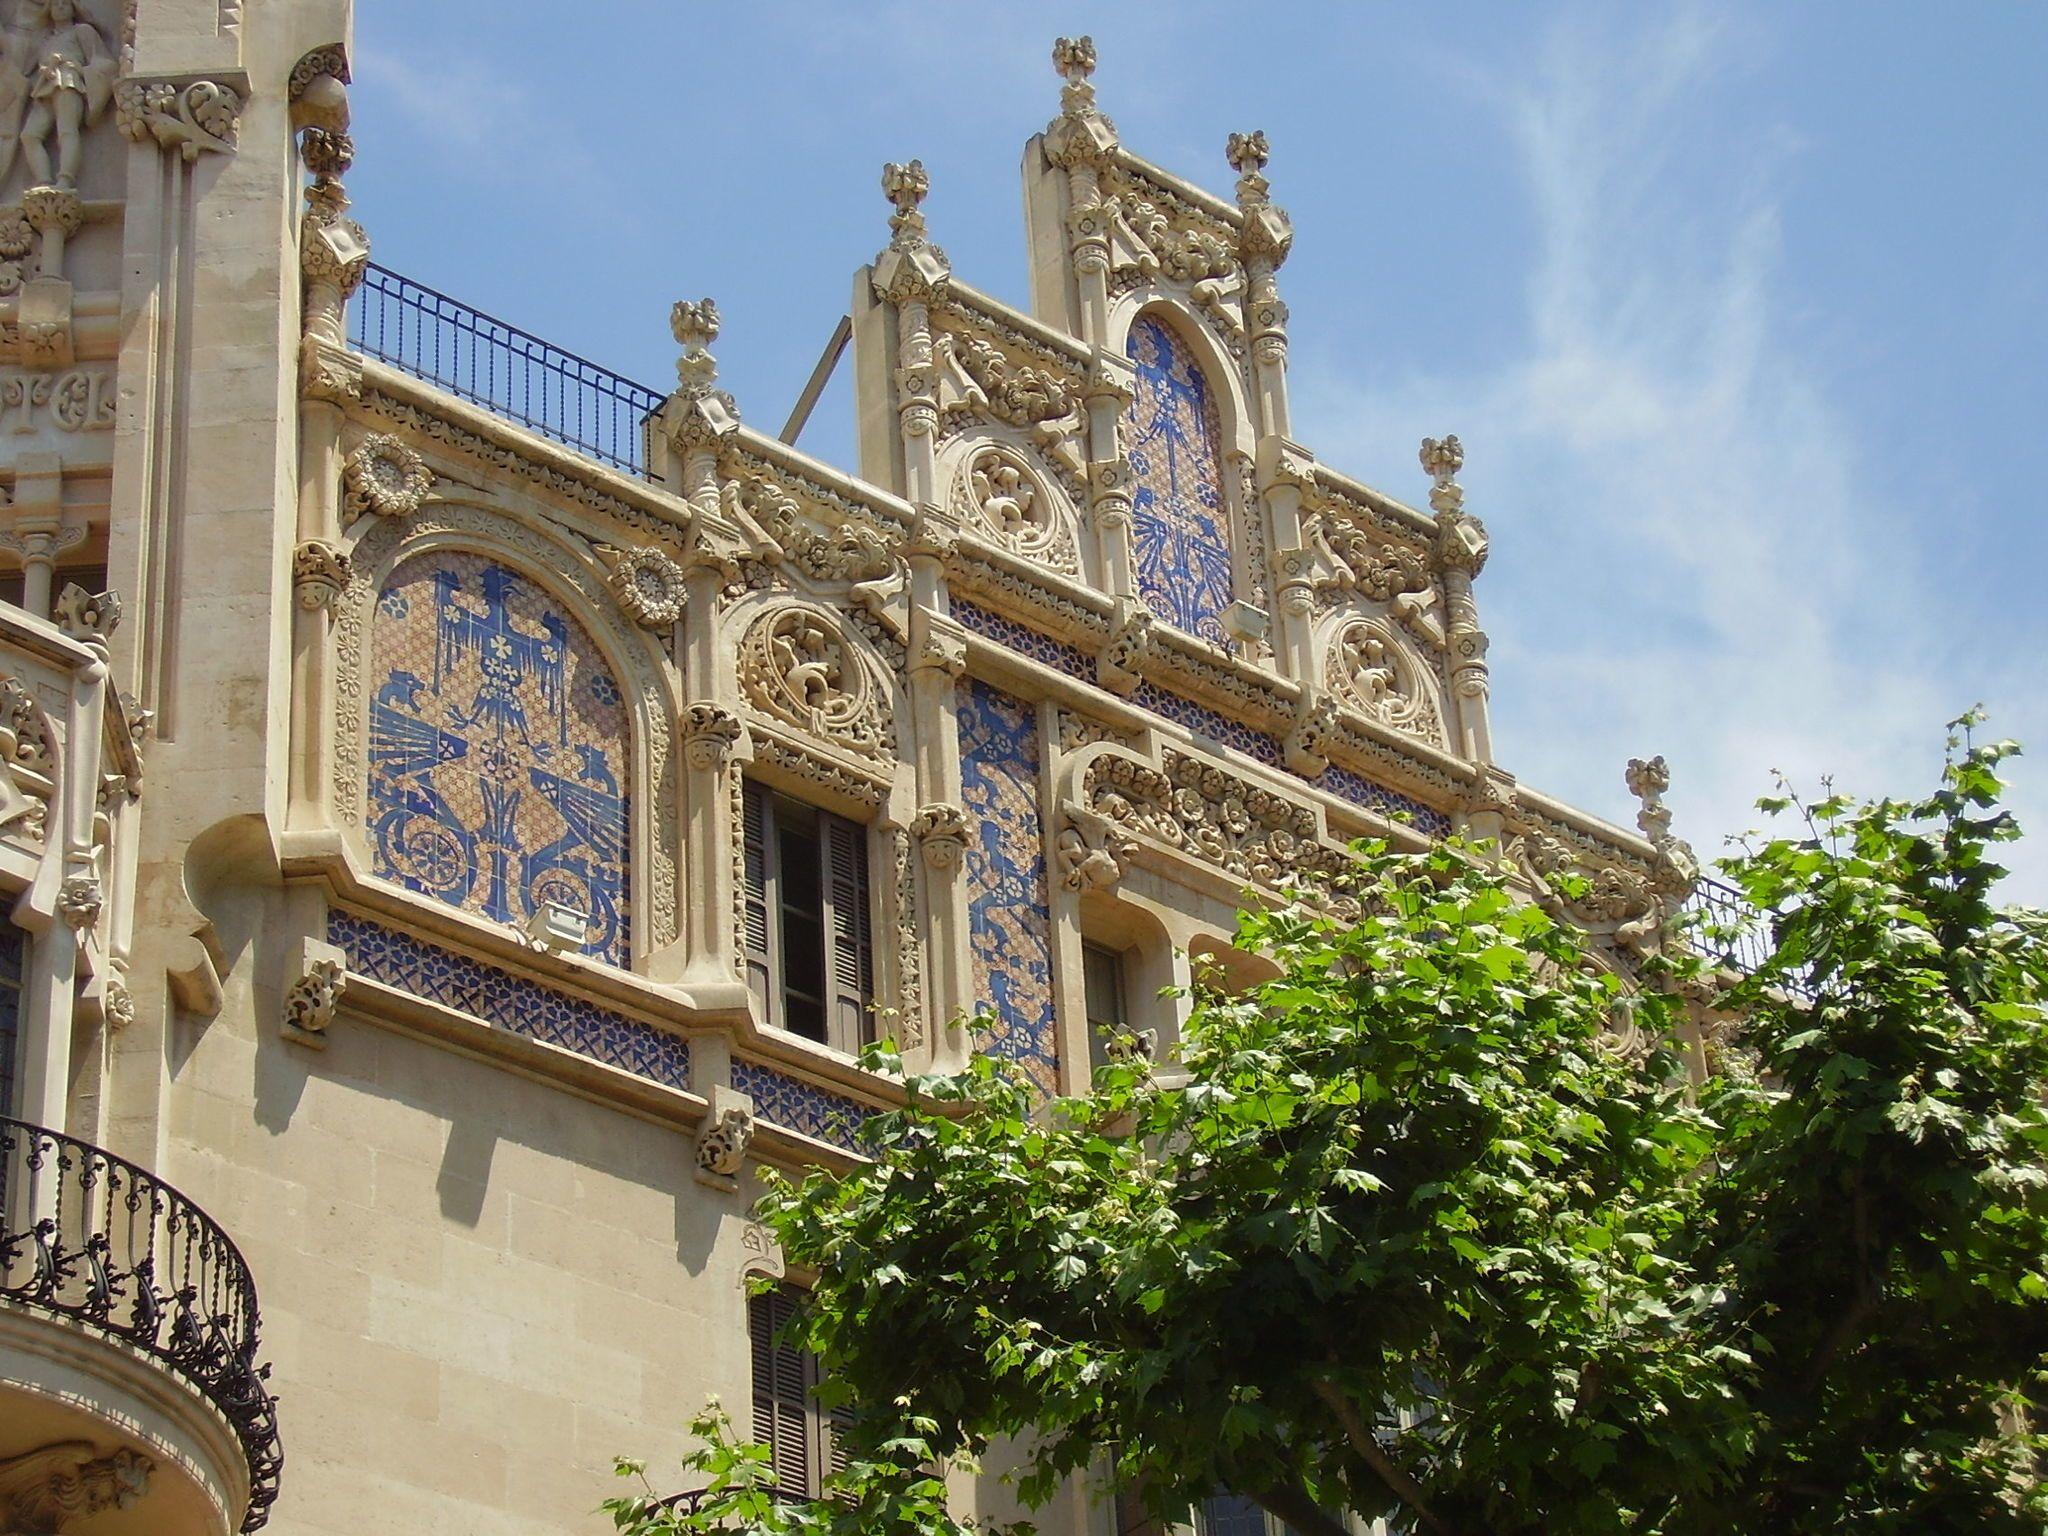 The Grand Hotel on Palma audio tour Palma's Alternative History Tour